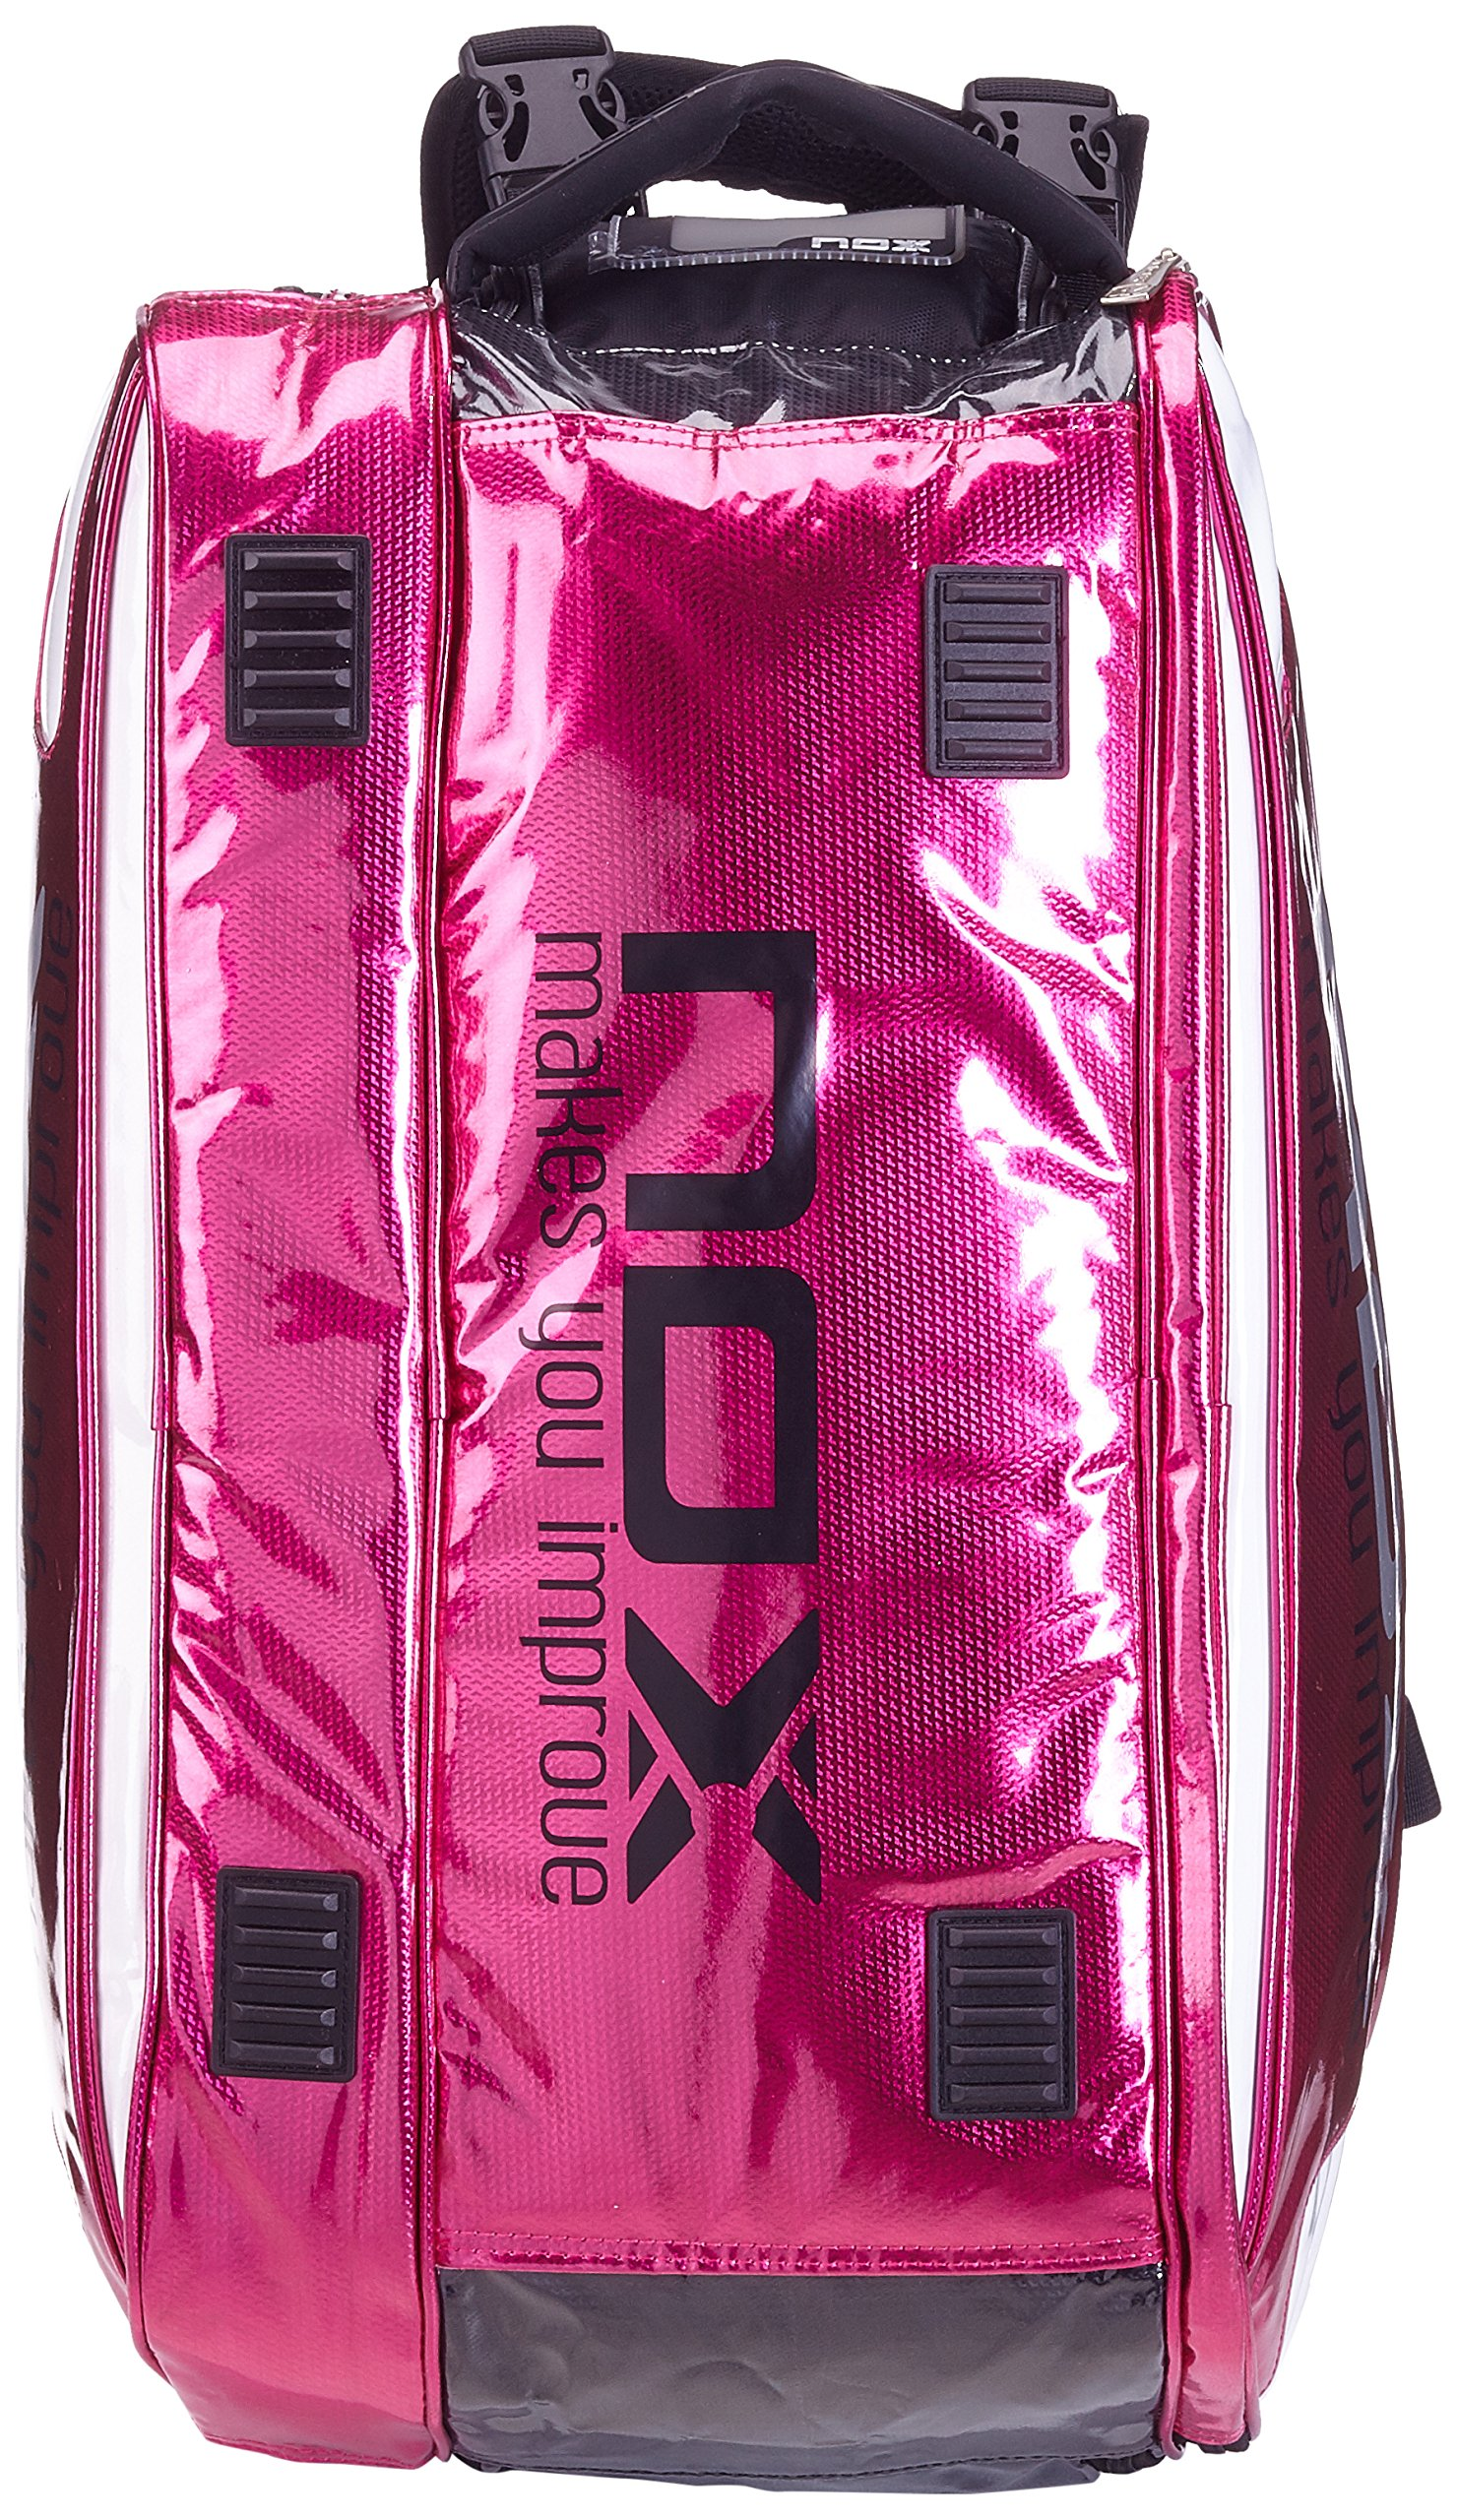 NOX Thermo Woman 16 Paletero, Mujer, Rosa product image